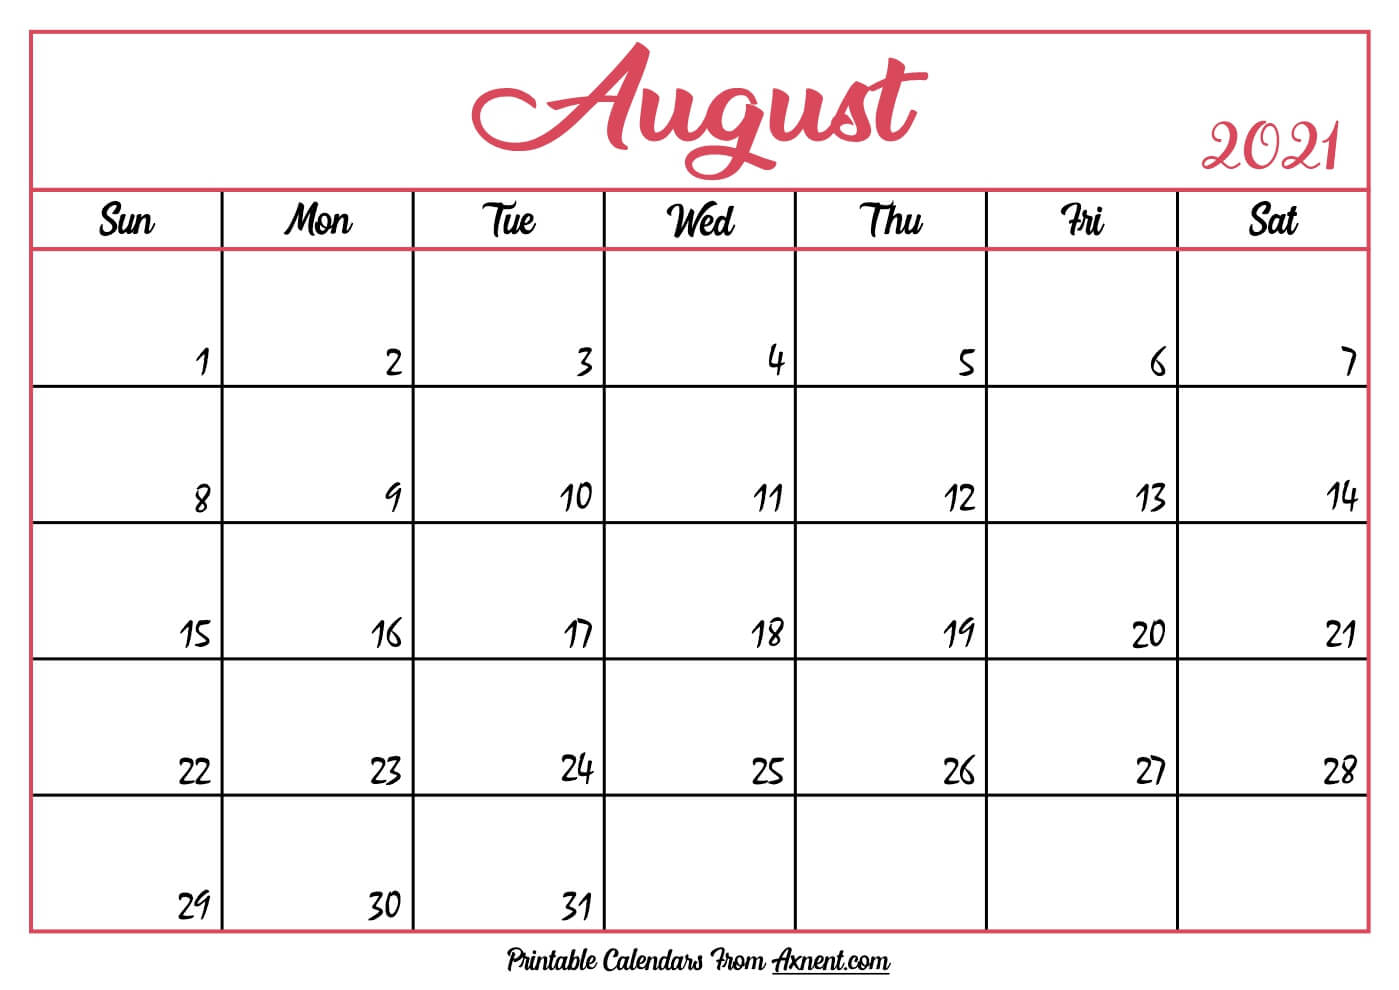 Printable August 2021 Calendar Template - Print Now